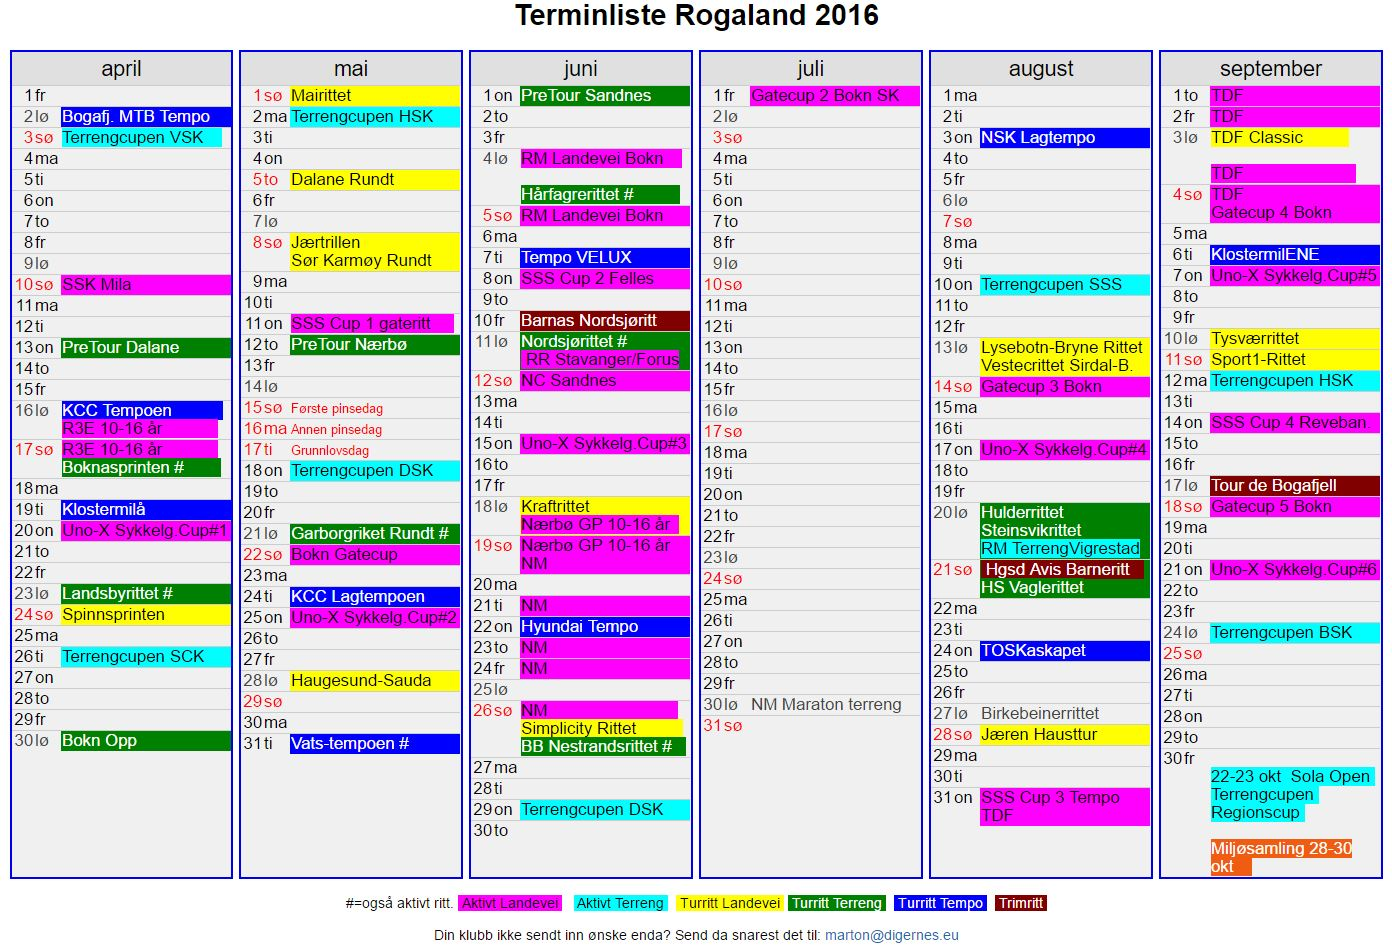 TerminRogaland201626